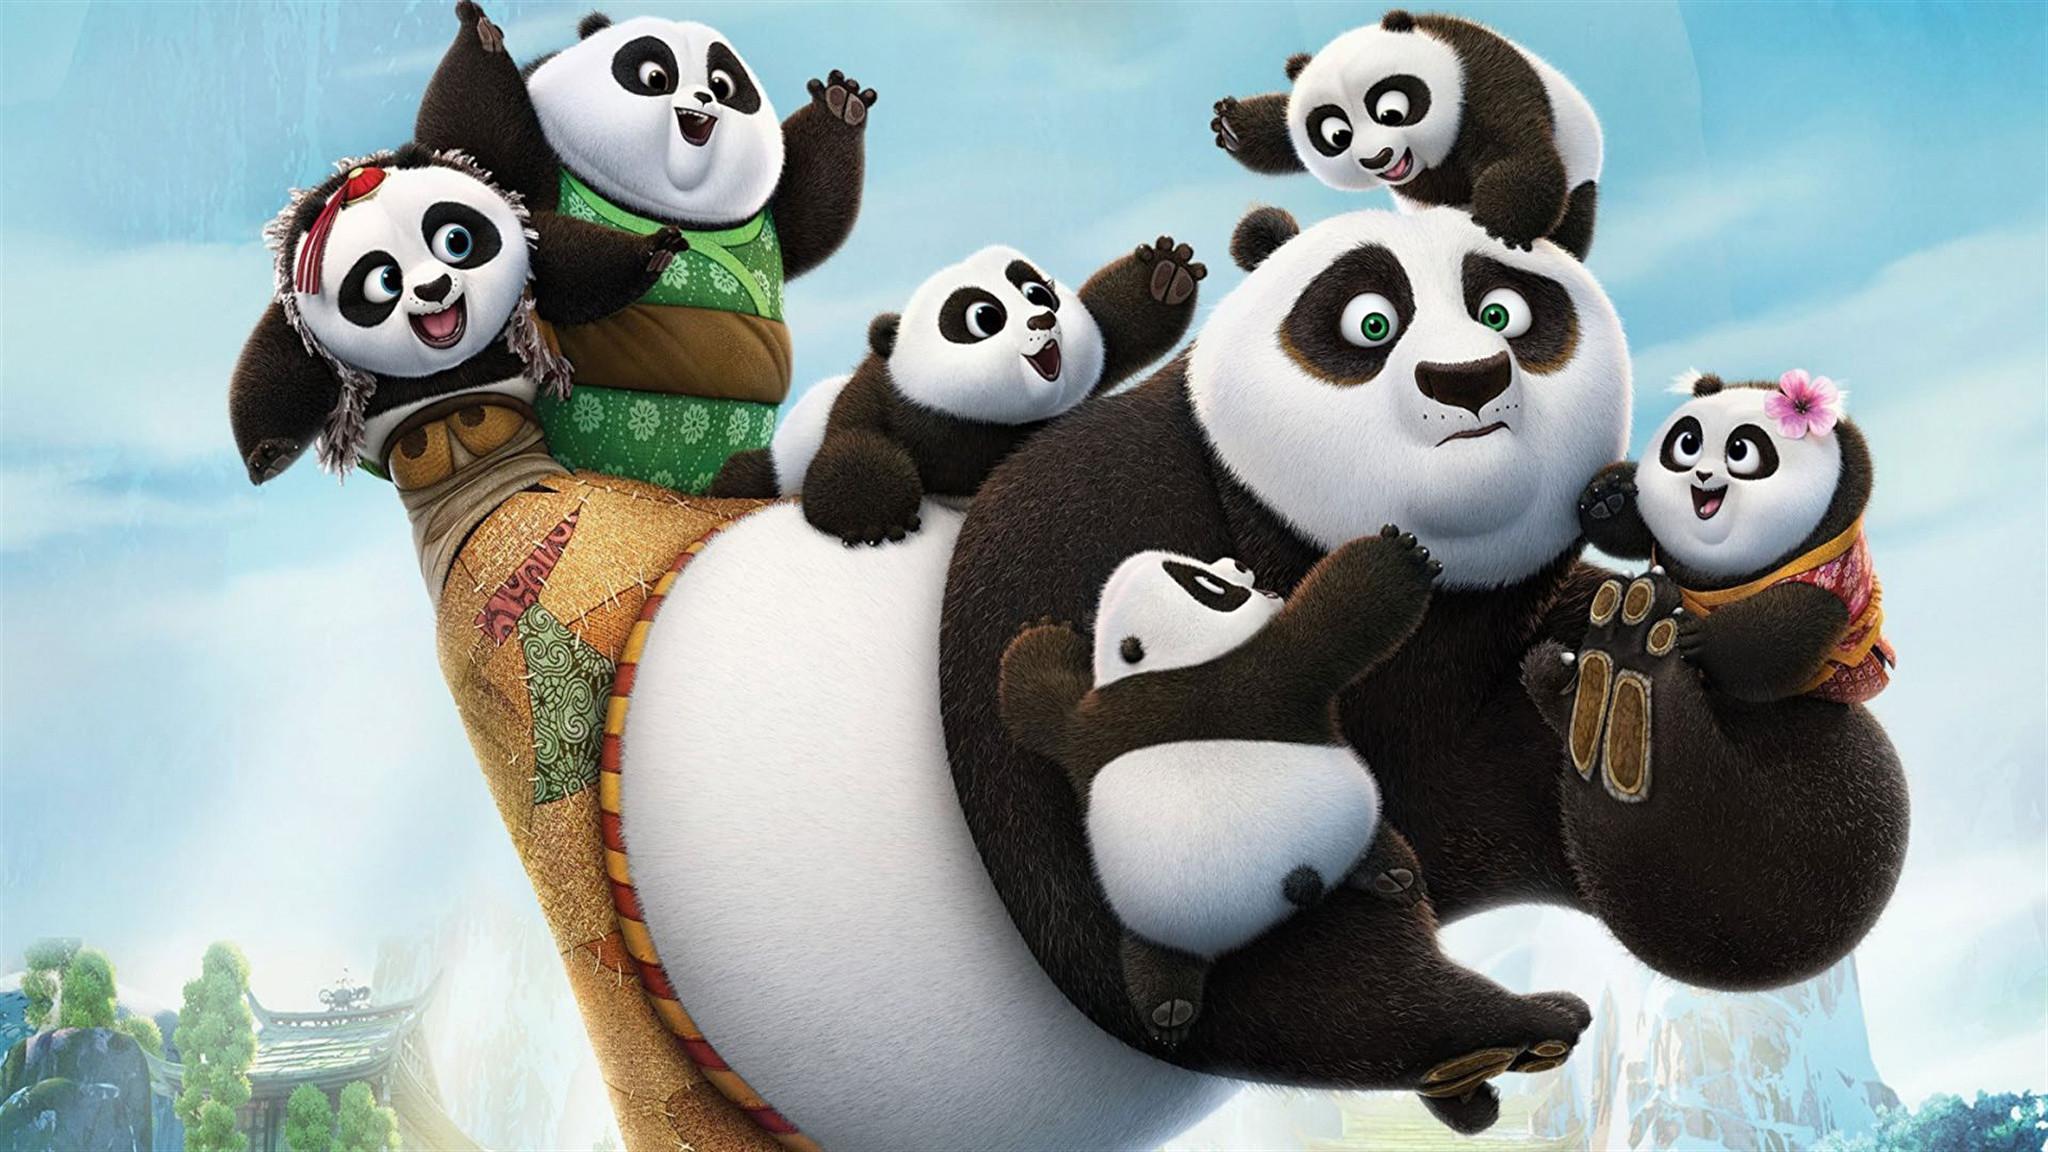 Wallpapers Kung Fu Panda Pandas Bears Cartoons 2048×1152